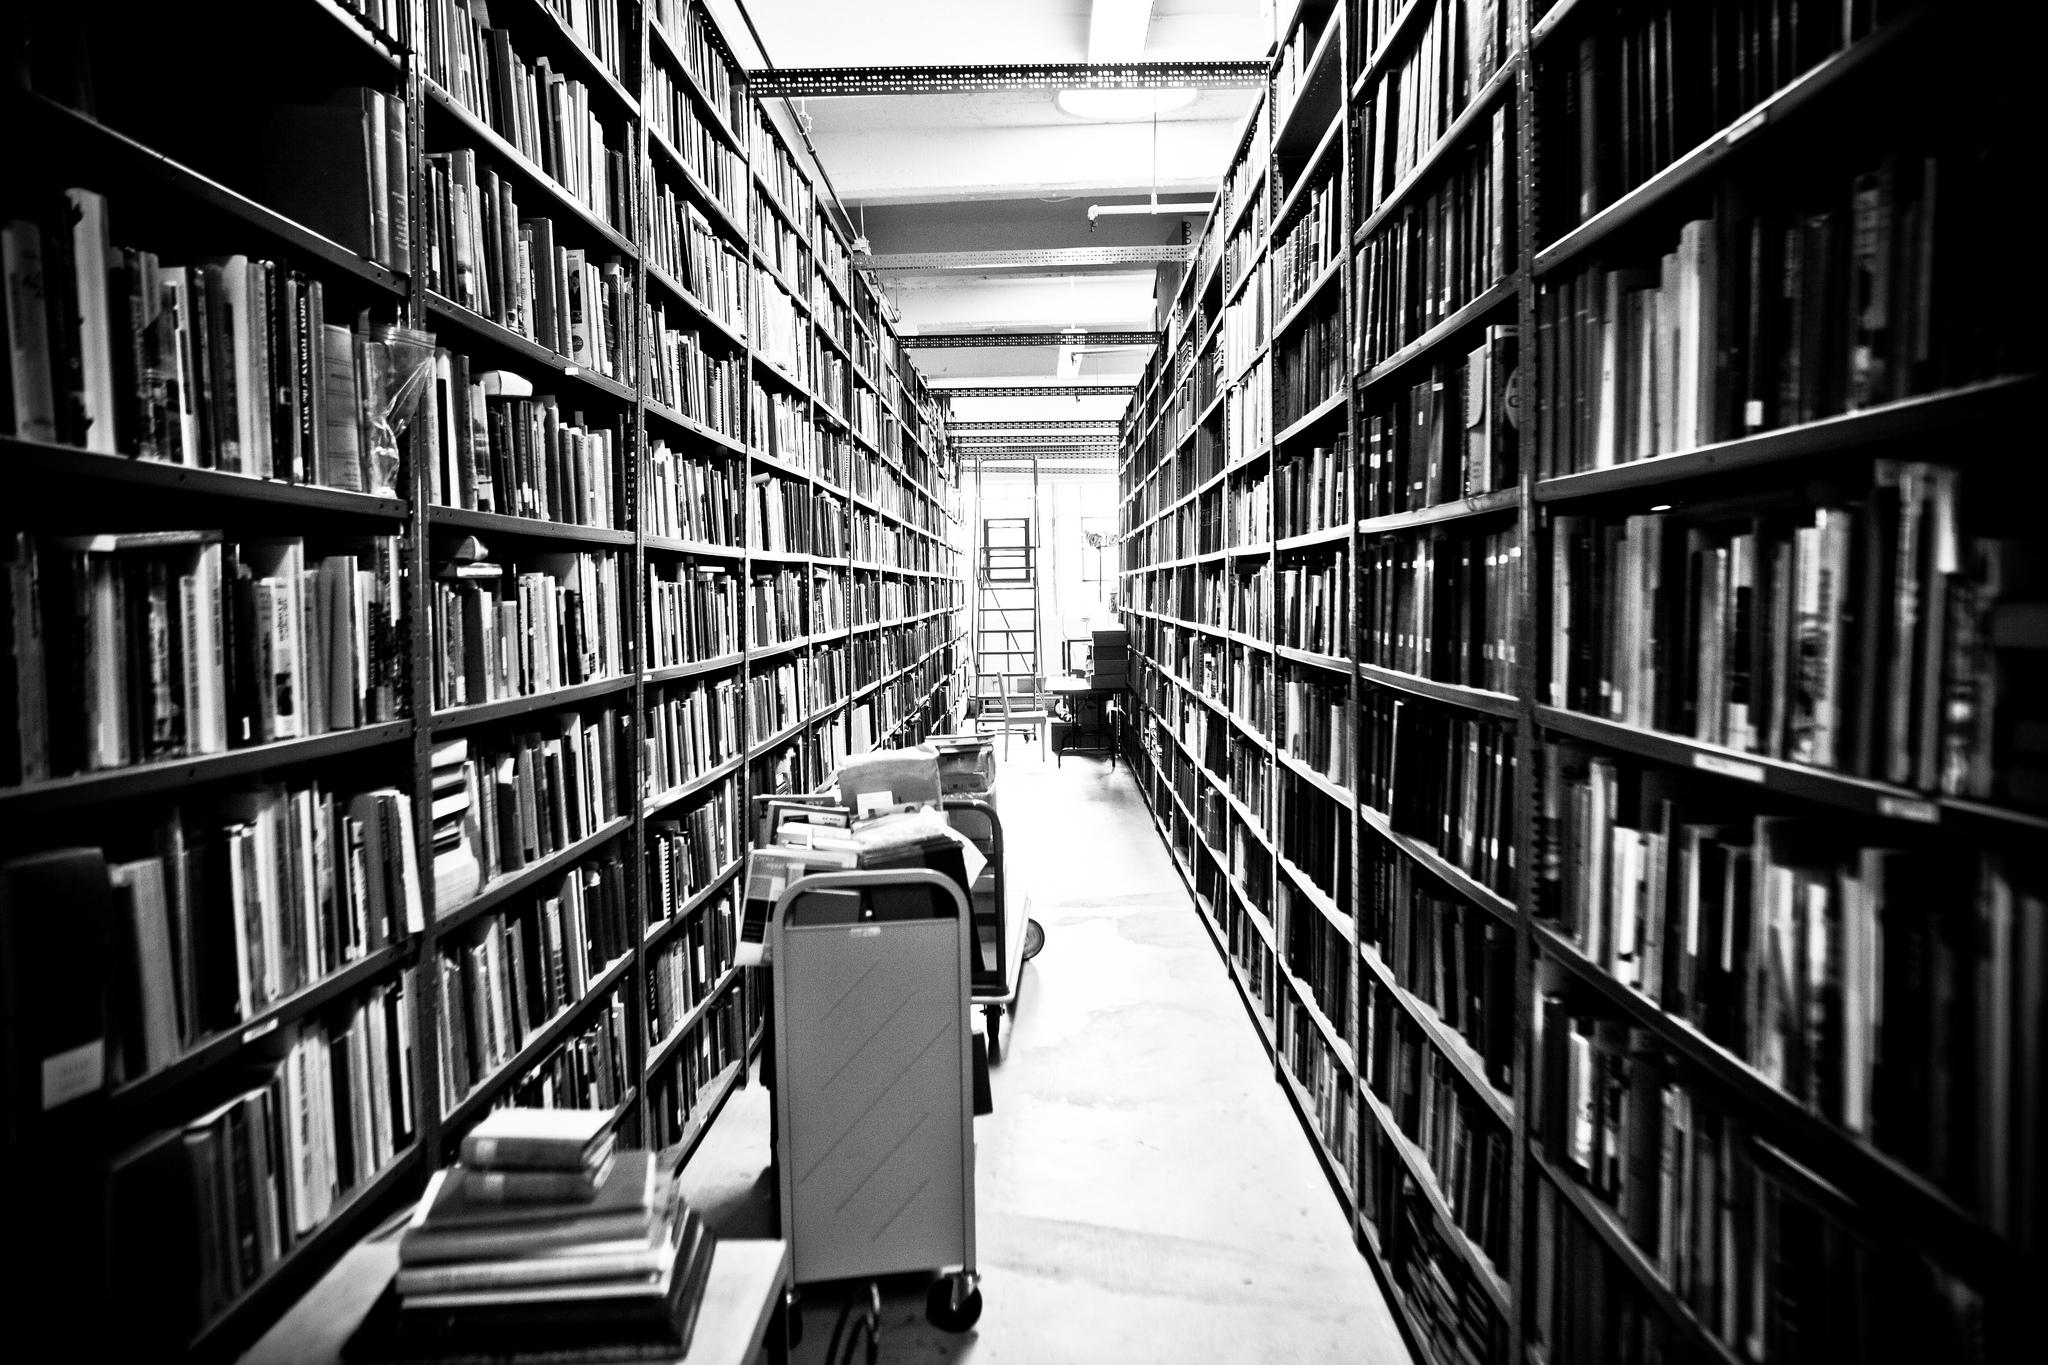 Aisle upon aisle of books in the SF Main Public Library. Thomas Hawk